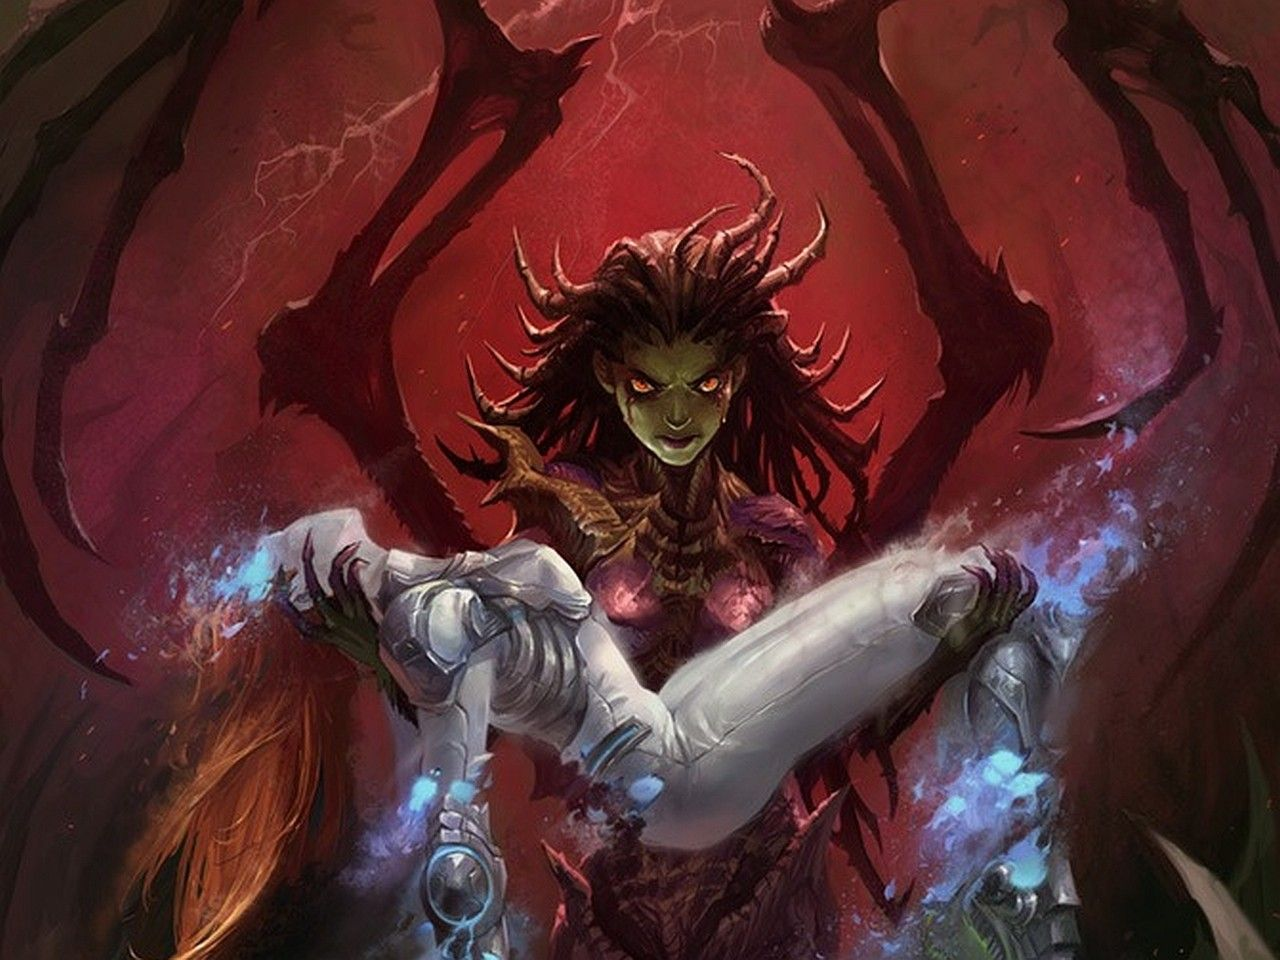 Starcraft fantasy art artwork sarah kerrigan queen of - Starcraft 2 wallpaper art ...